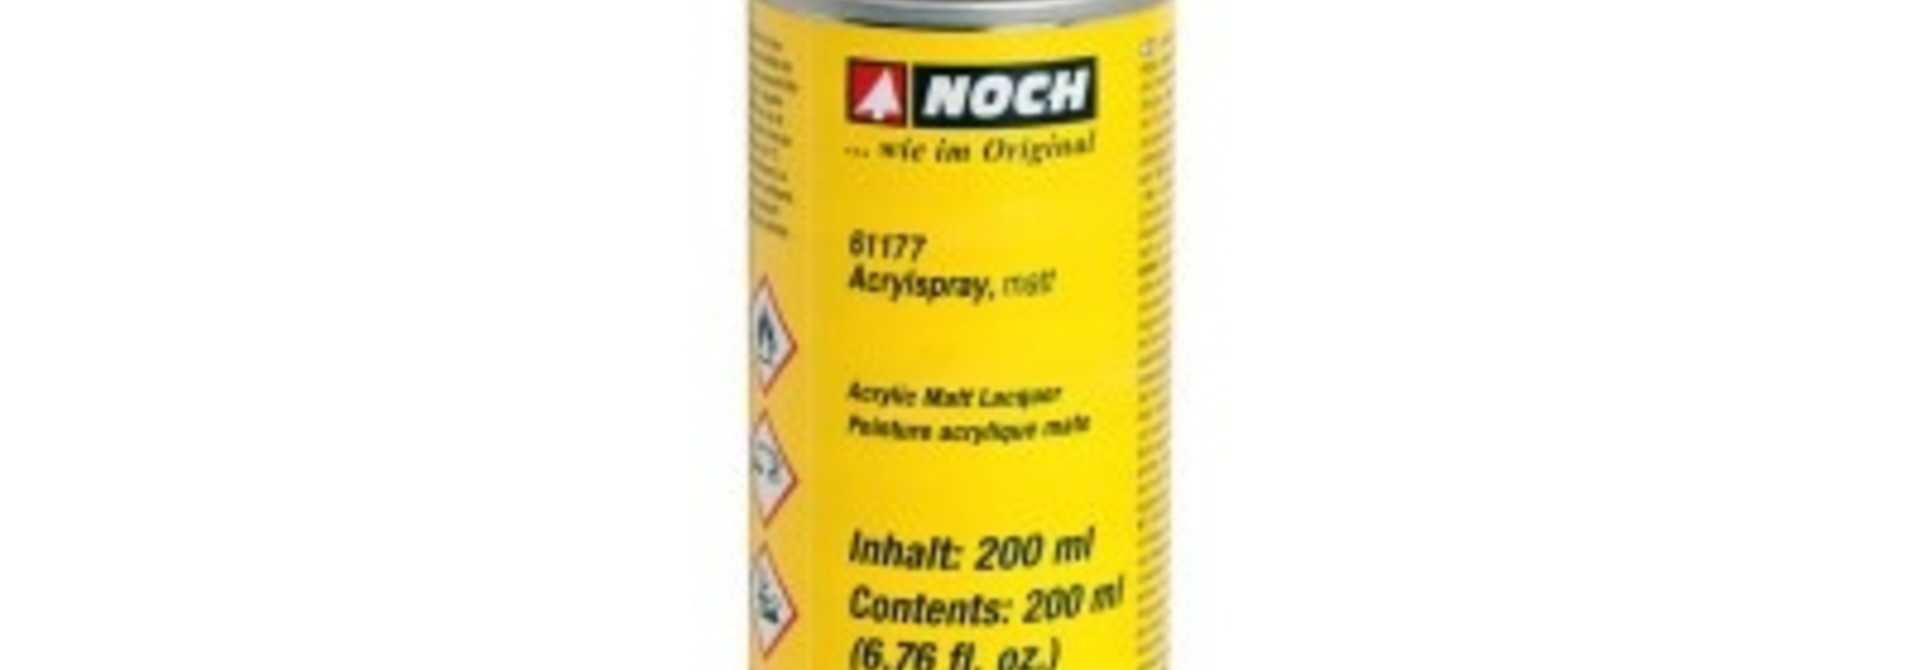 61177   Acrylspray, matt, schwarz